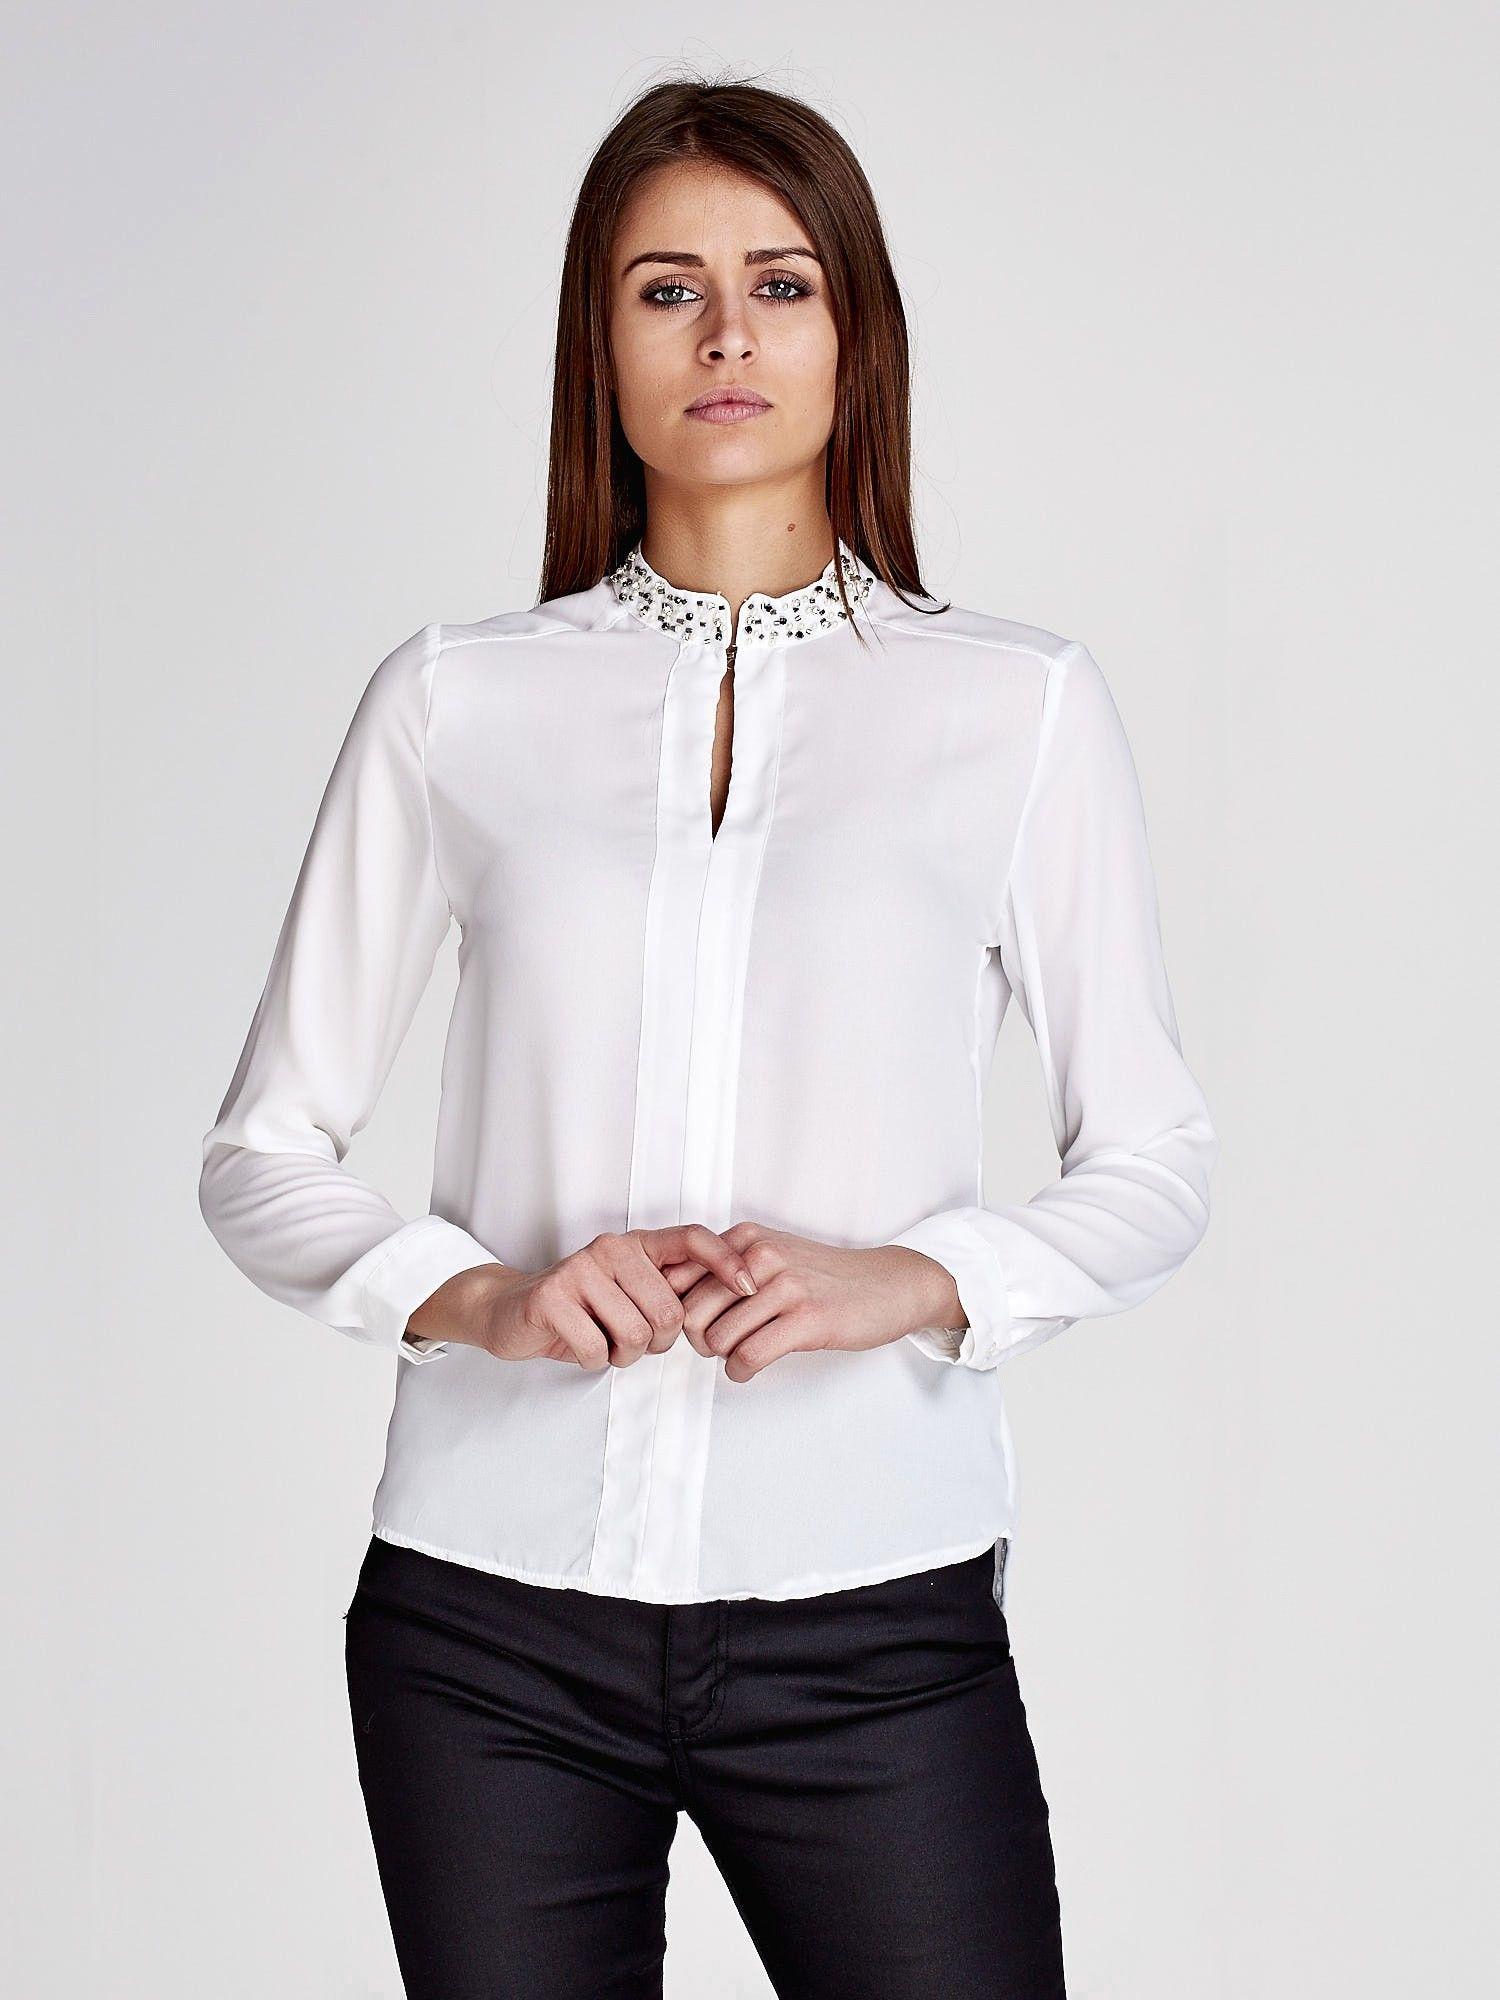 Eleganckie koszule damskie do biura Trendseterki  RZ4oG